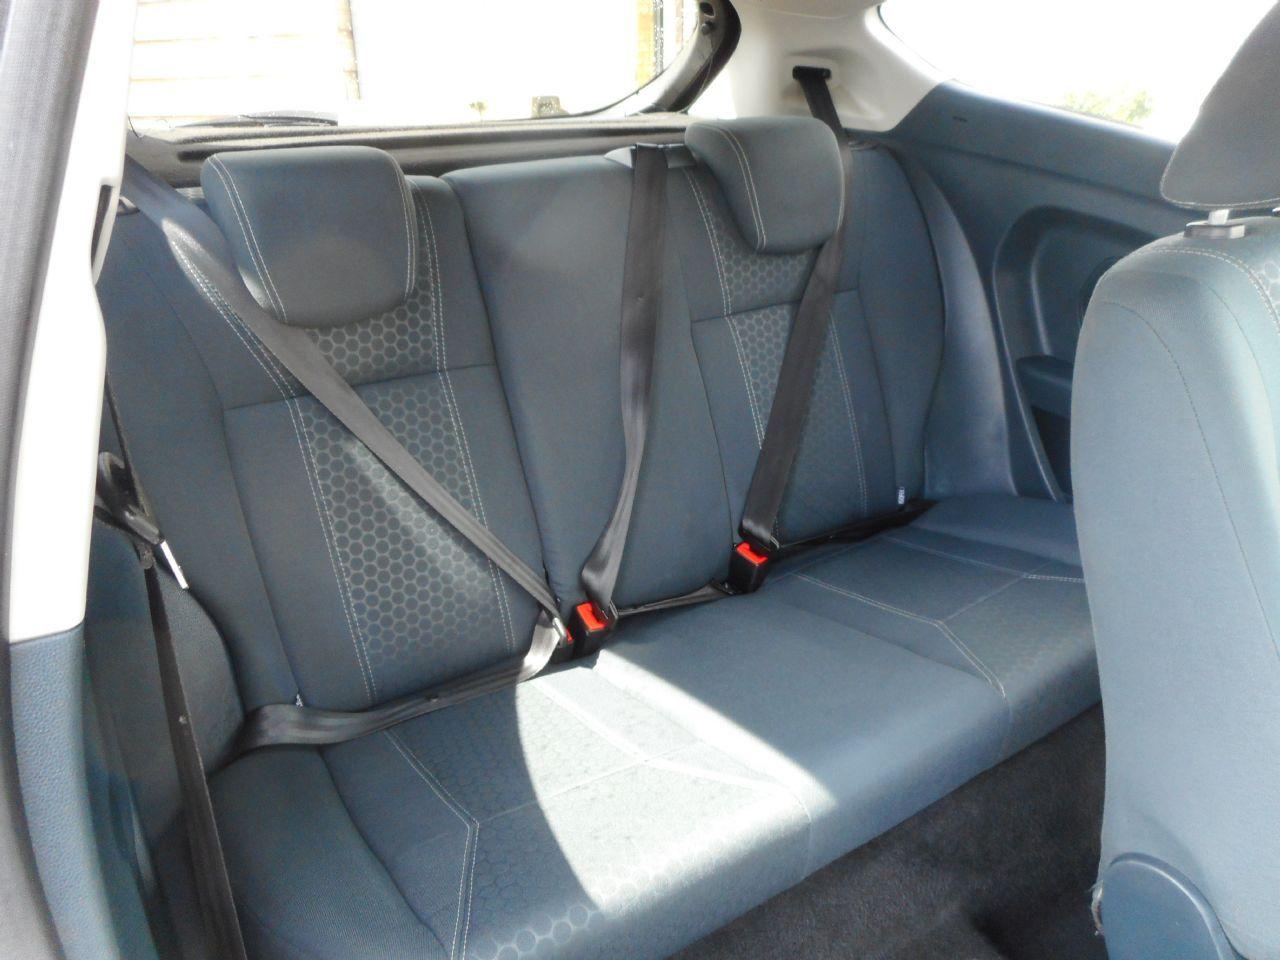 FORD Fiesta Titanium 1.4 096 Auto (2012) - Picture 6